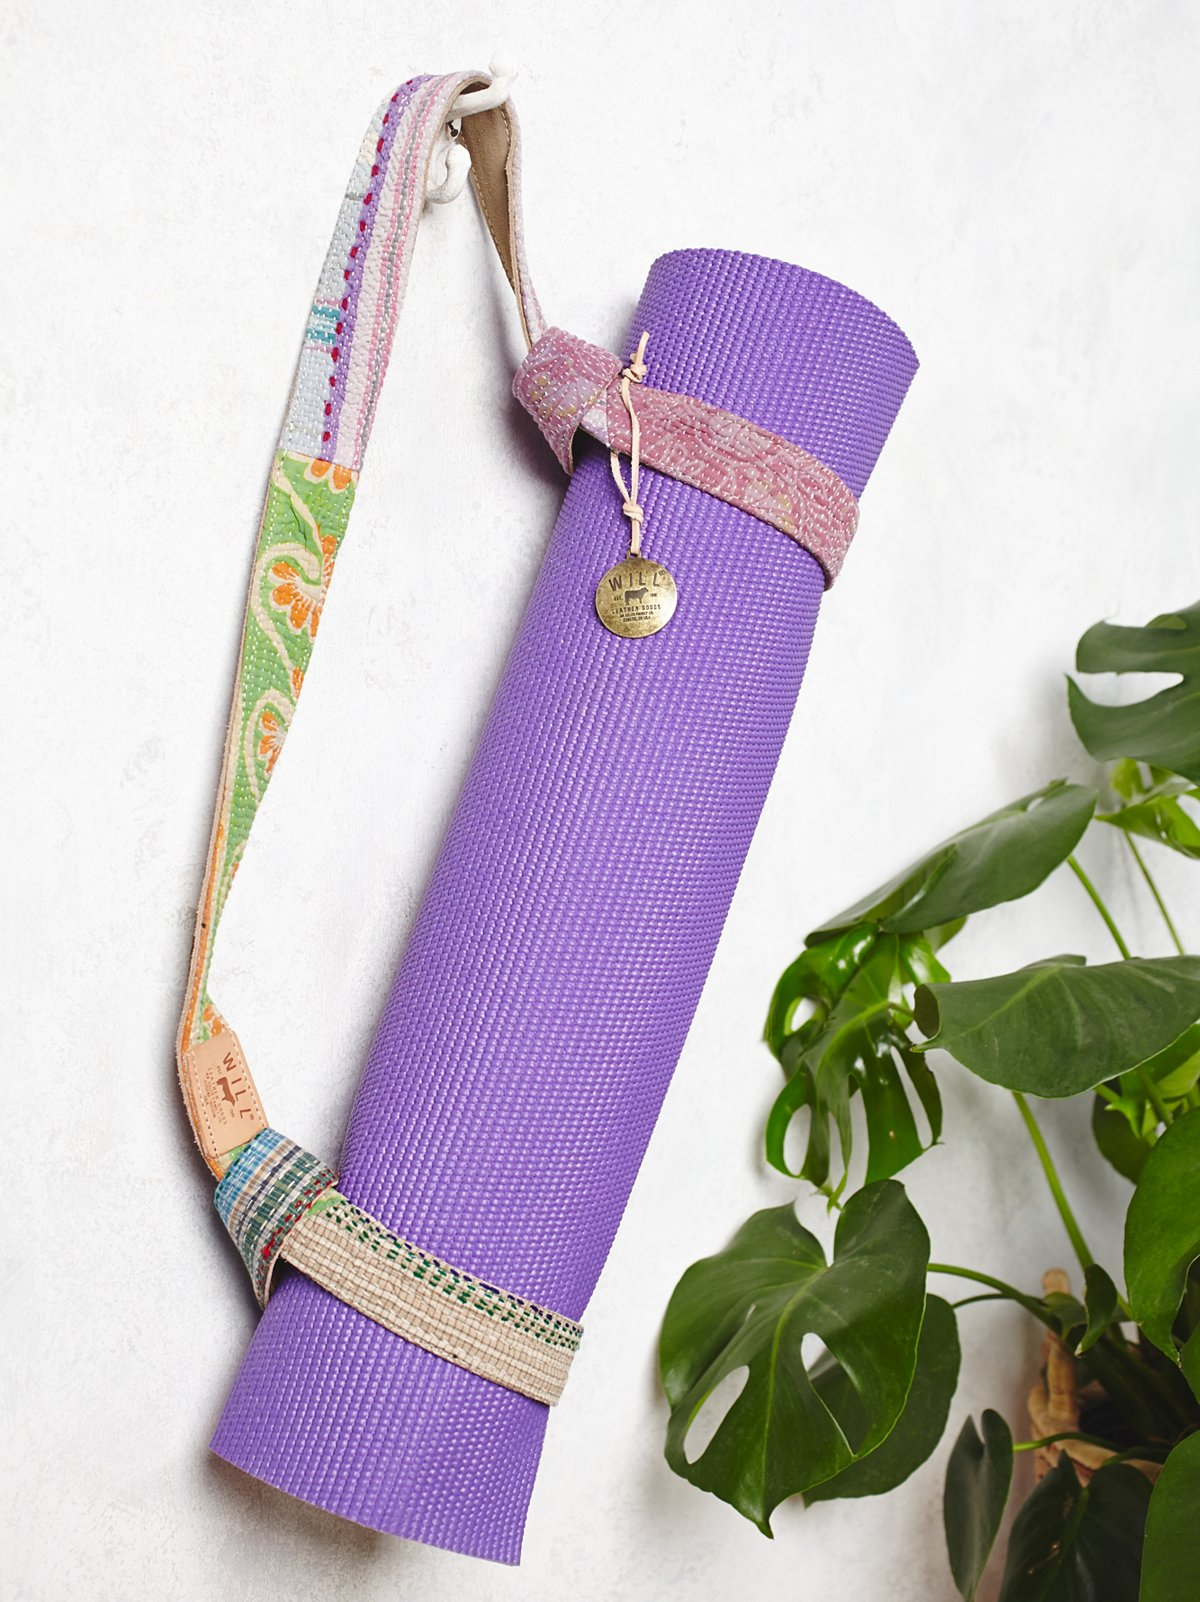 Kantha瑜伽垫捆绑带